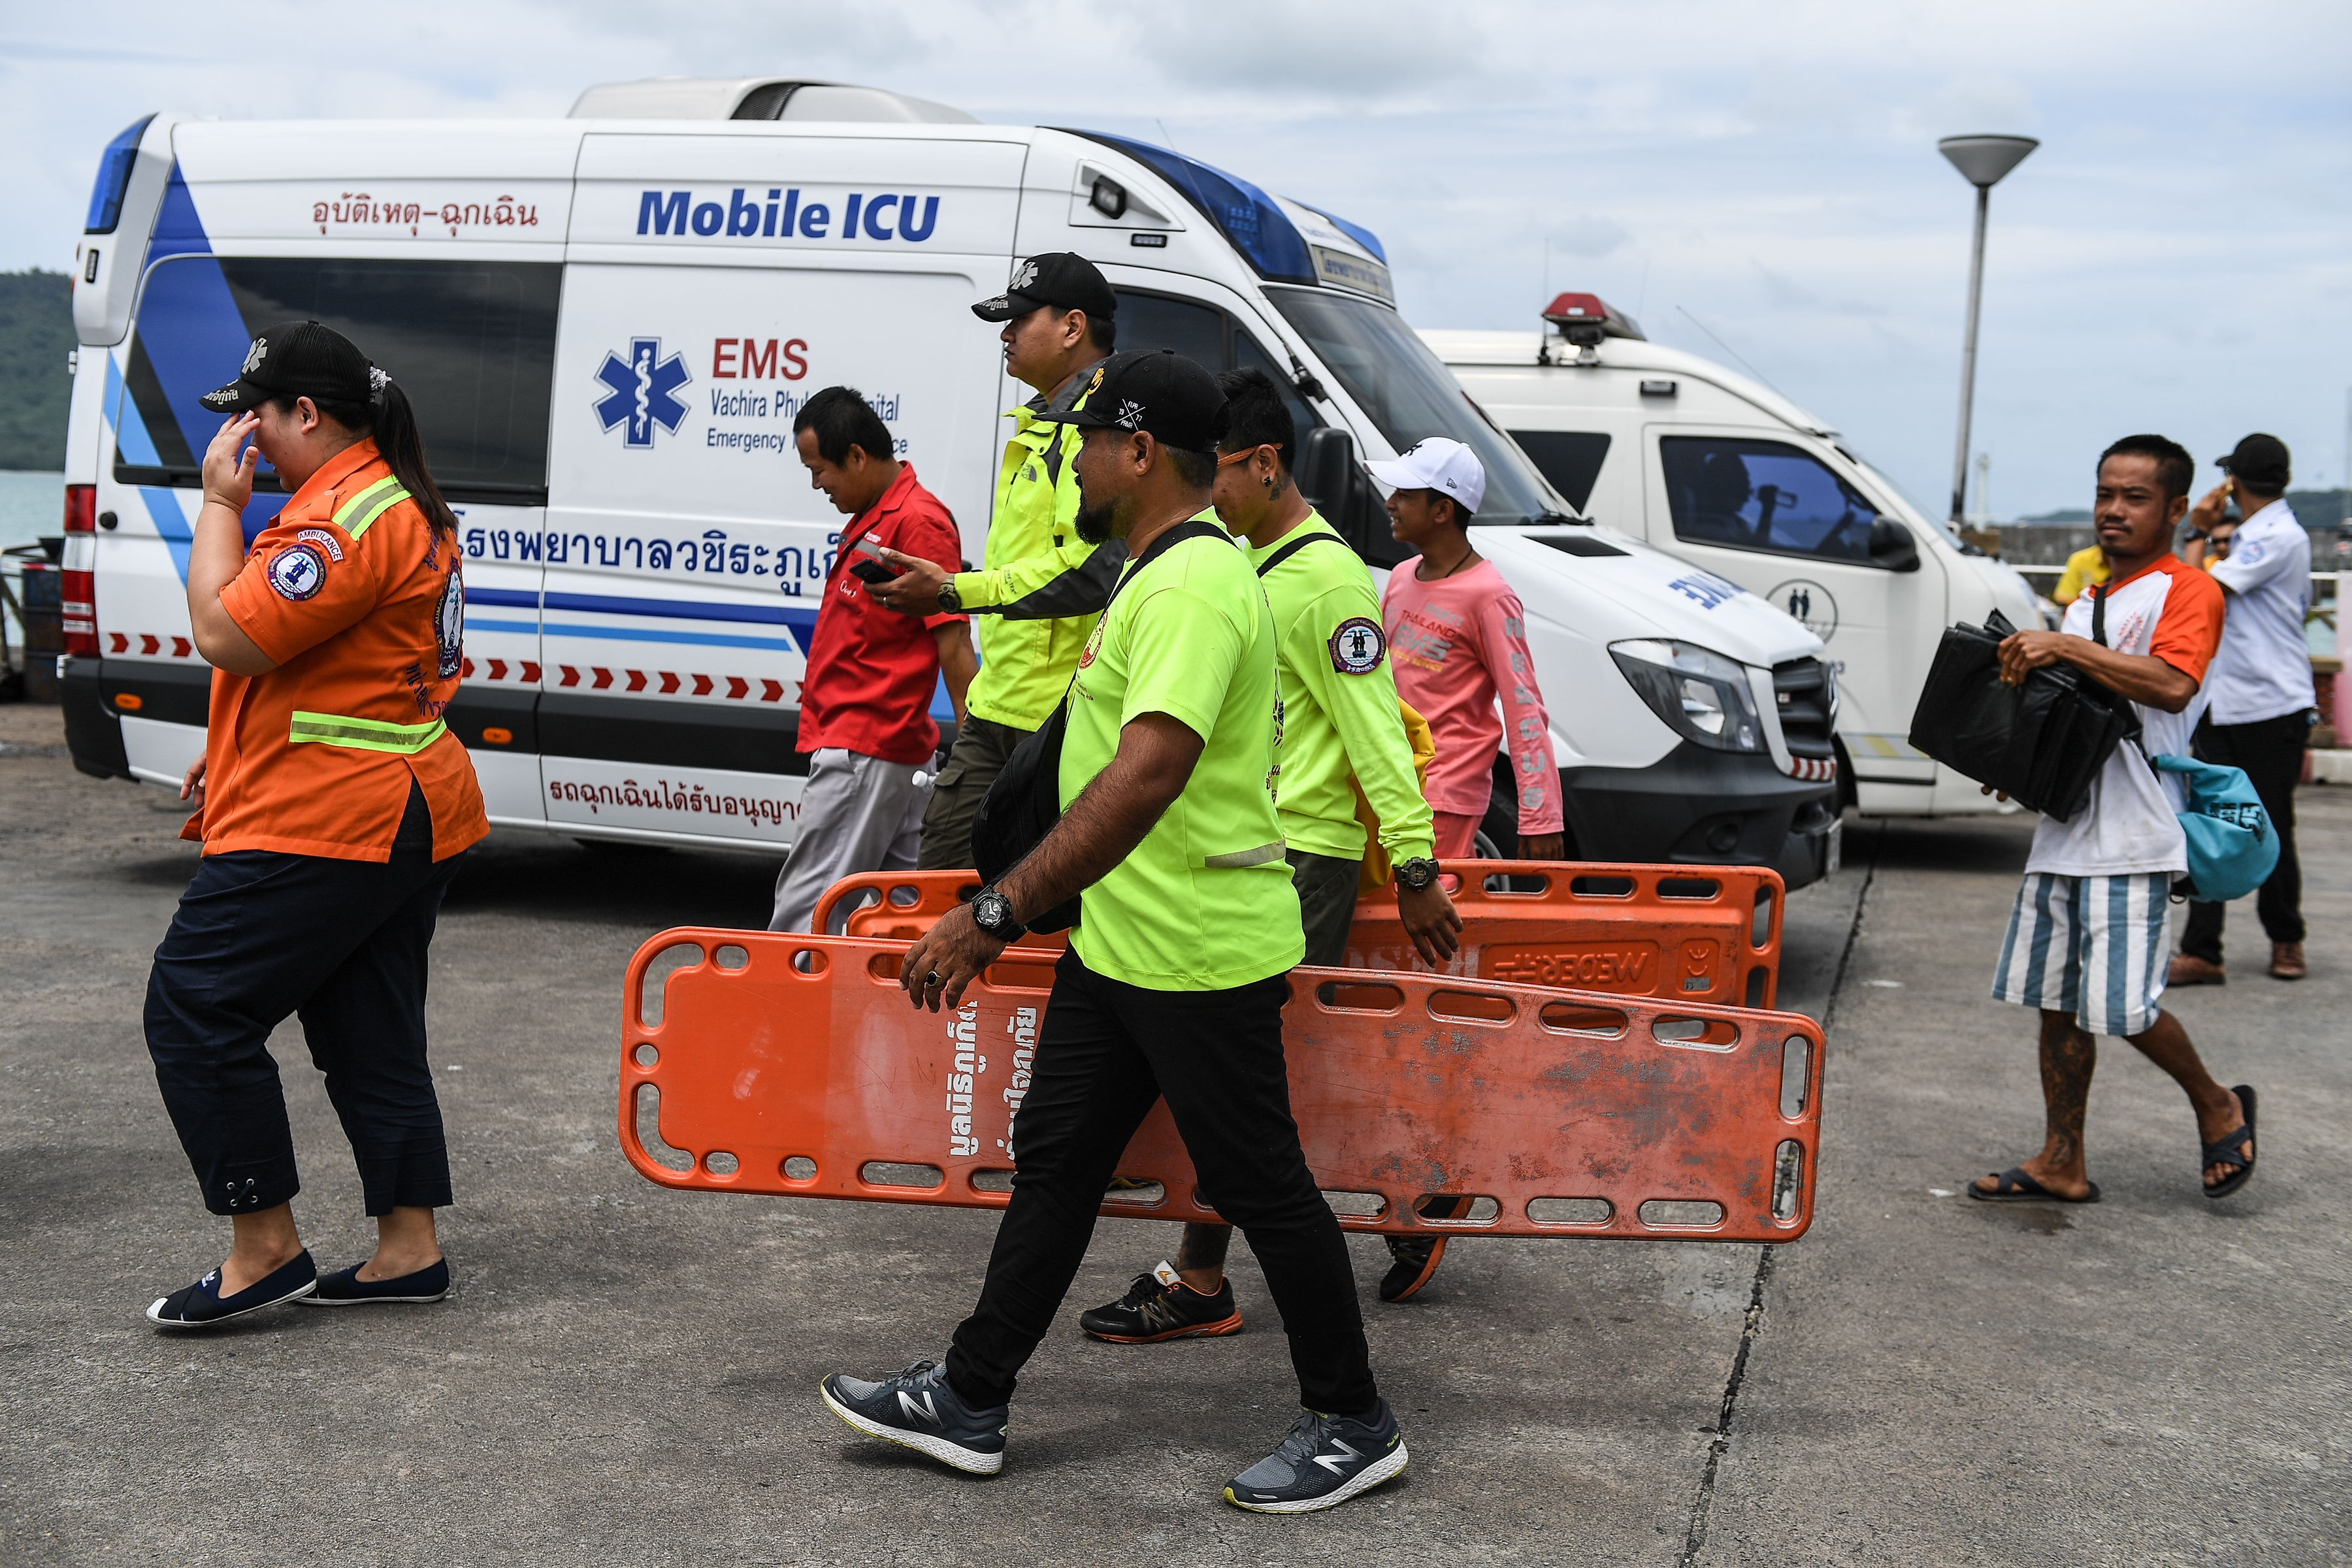 طوارئ فى تايلاند